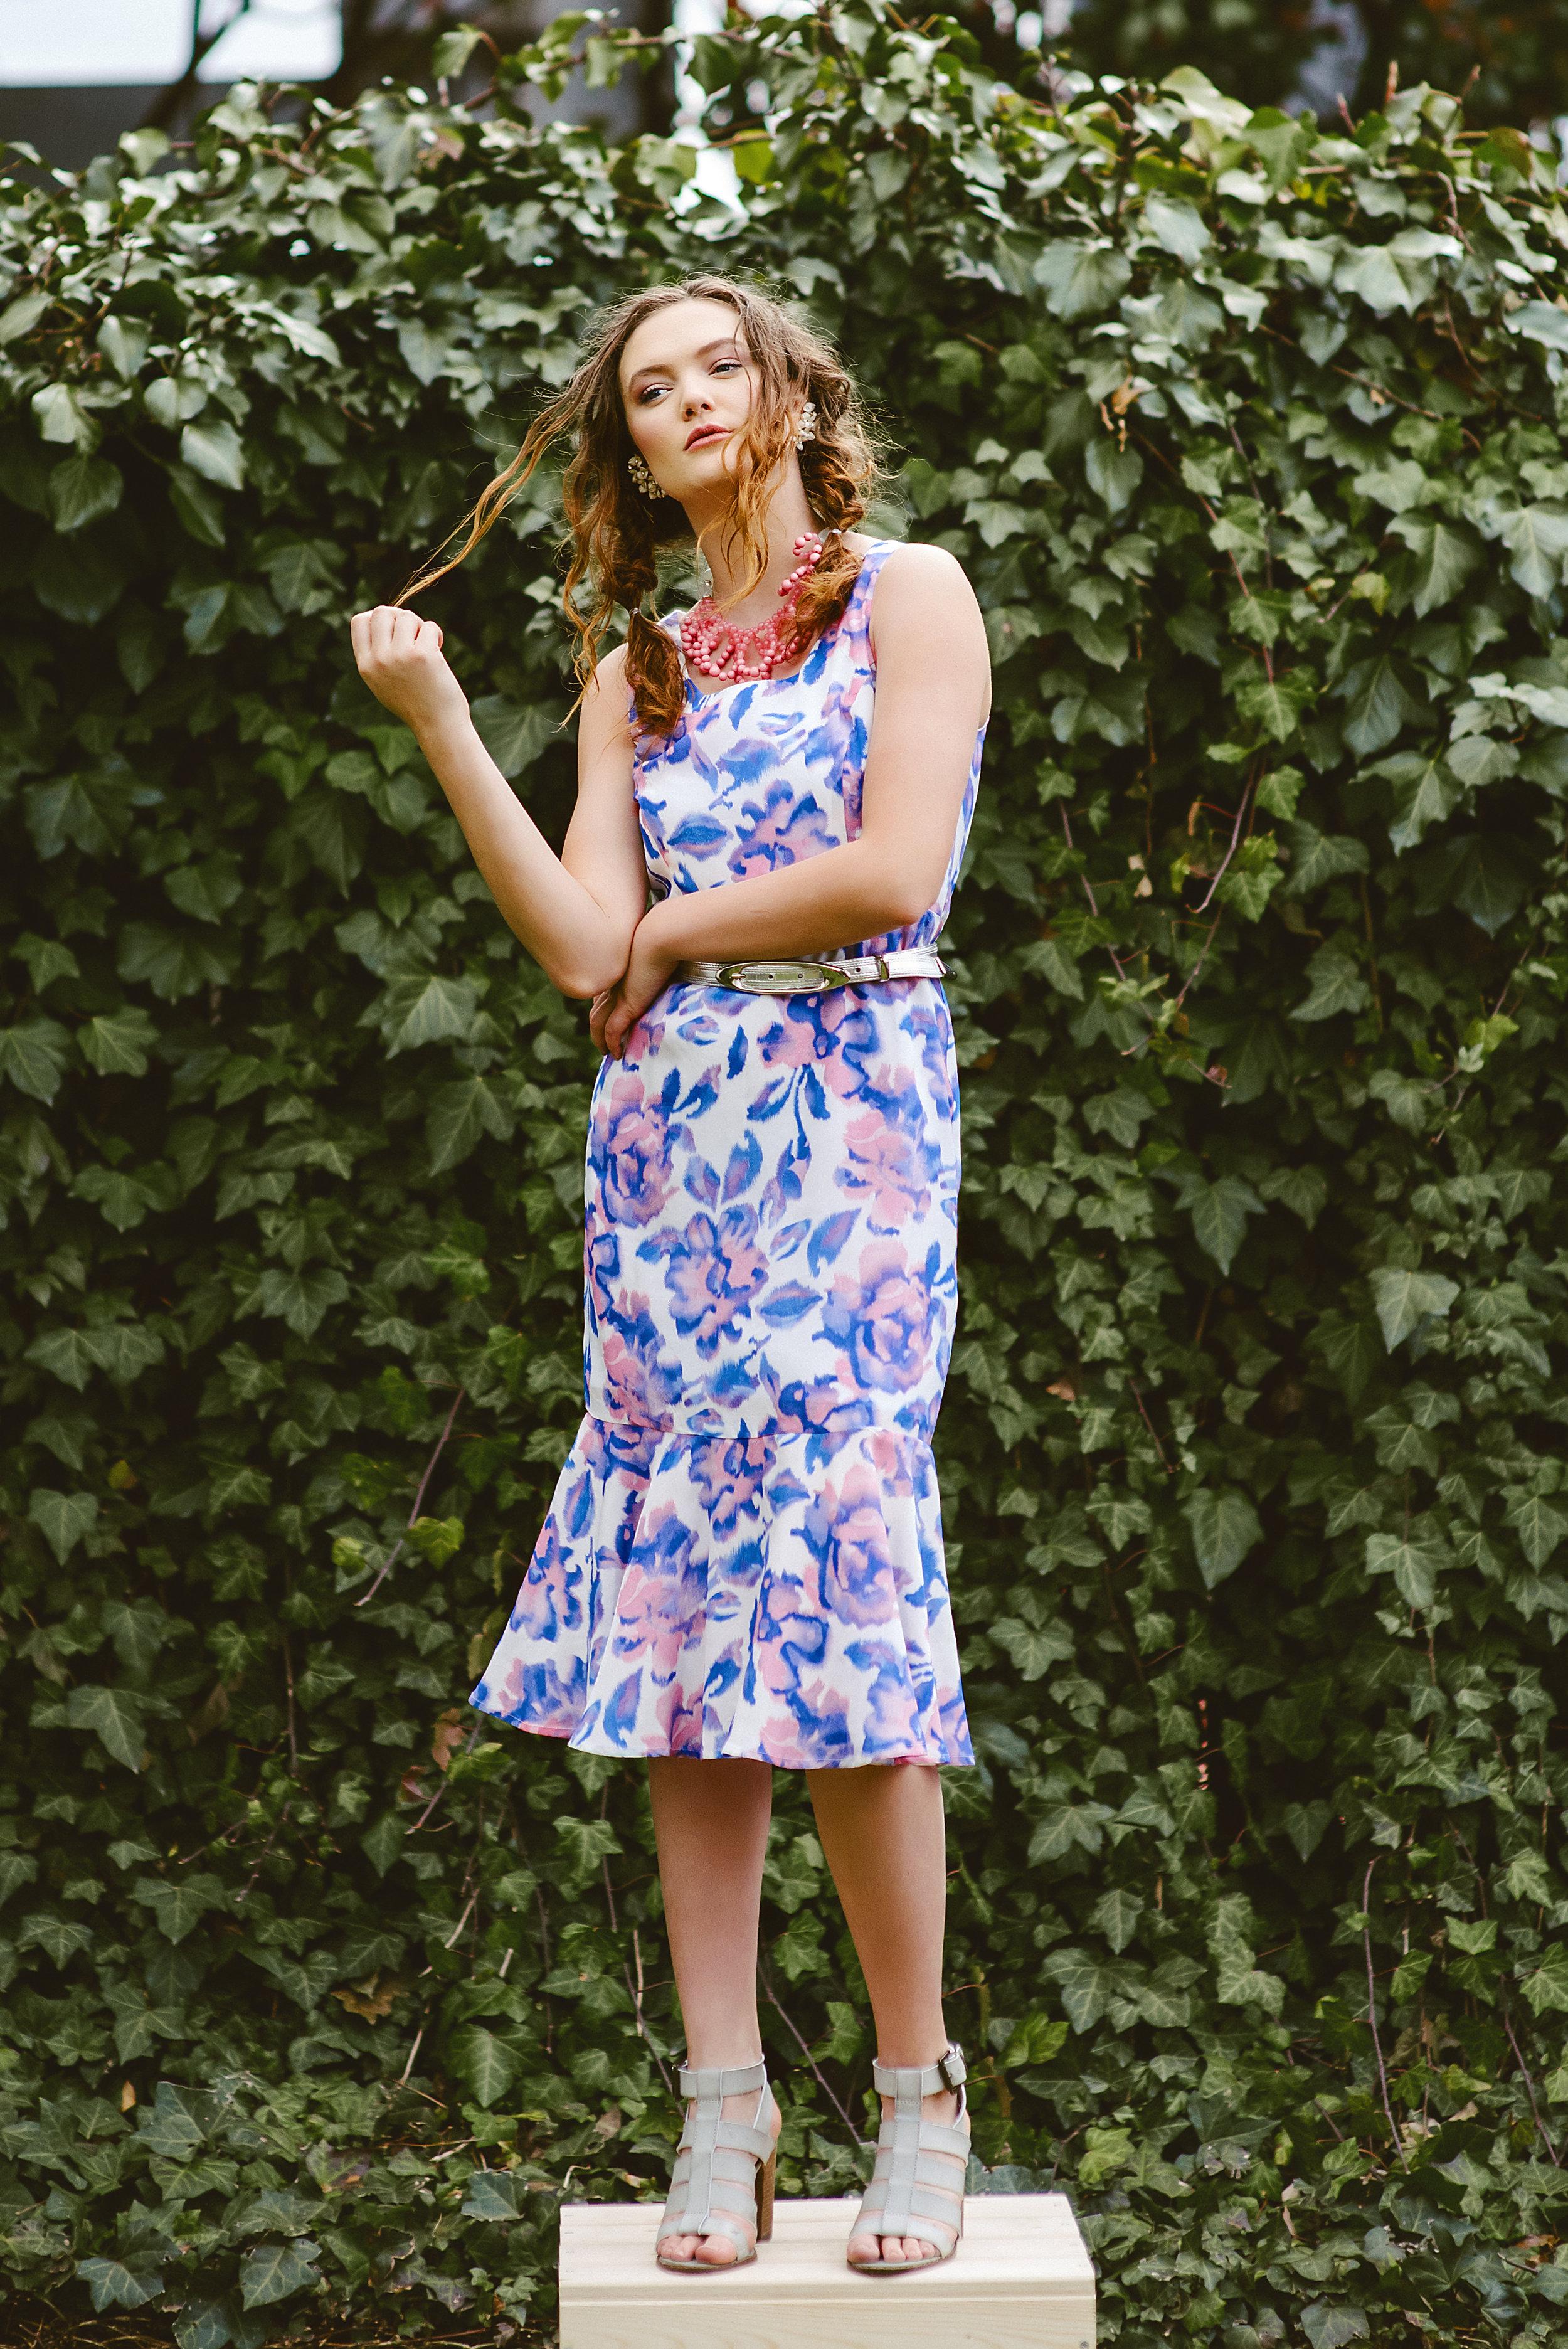 AK Spring/Summer '17 - Angela Kim Designs-Asheville, NC (model- Faye Foley)